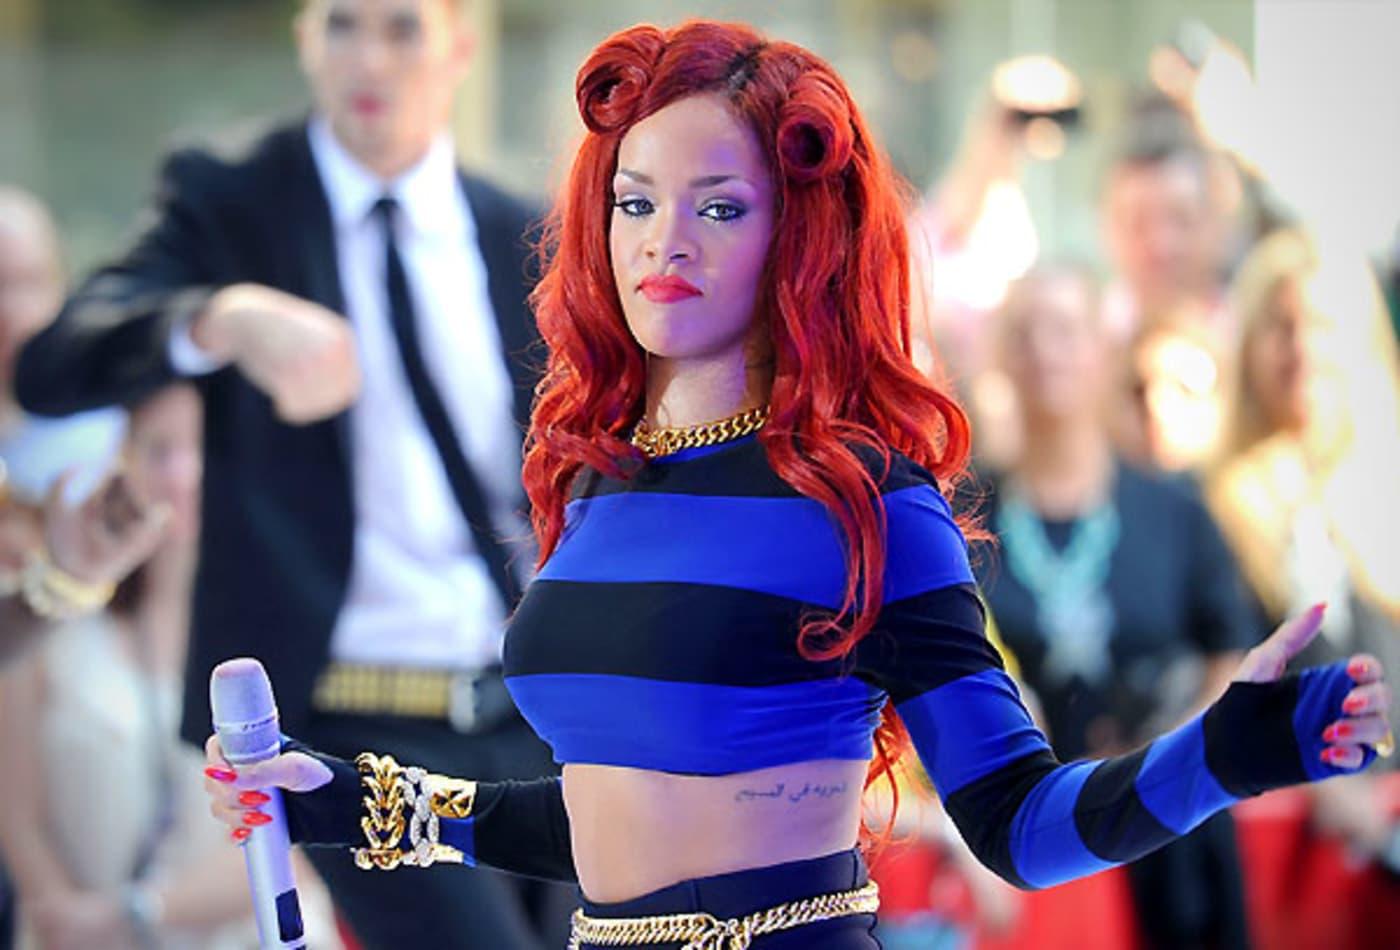 SS_Celebrity_Extravagances_Rhianna.jpg